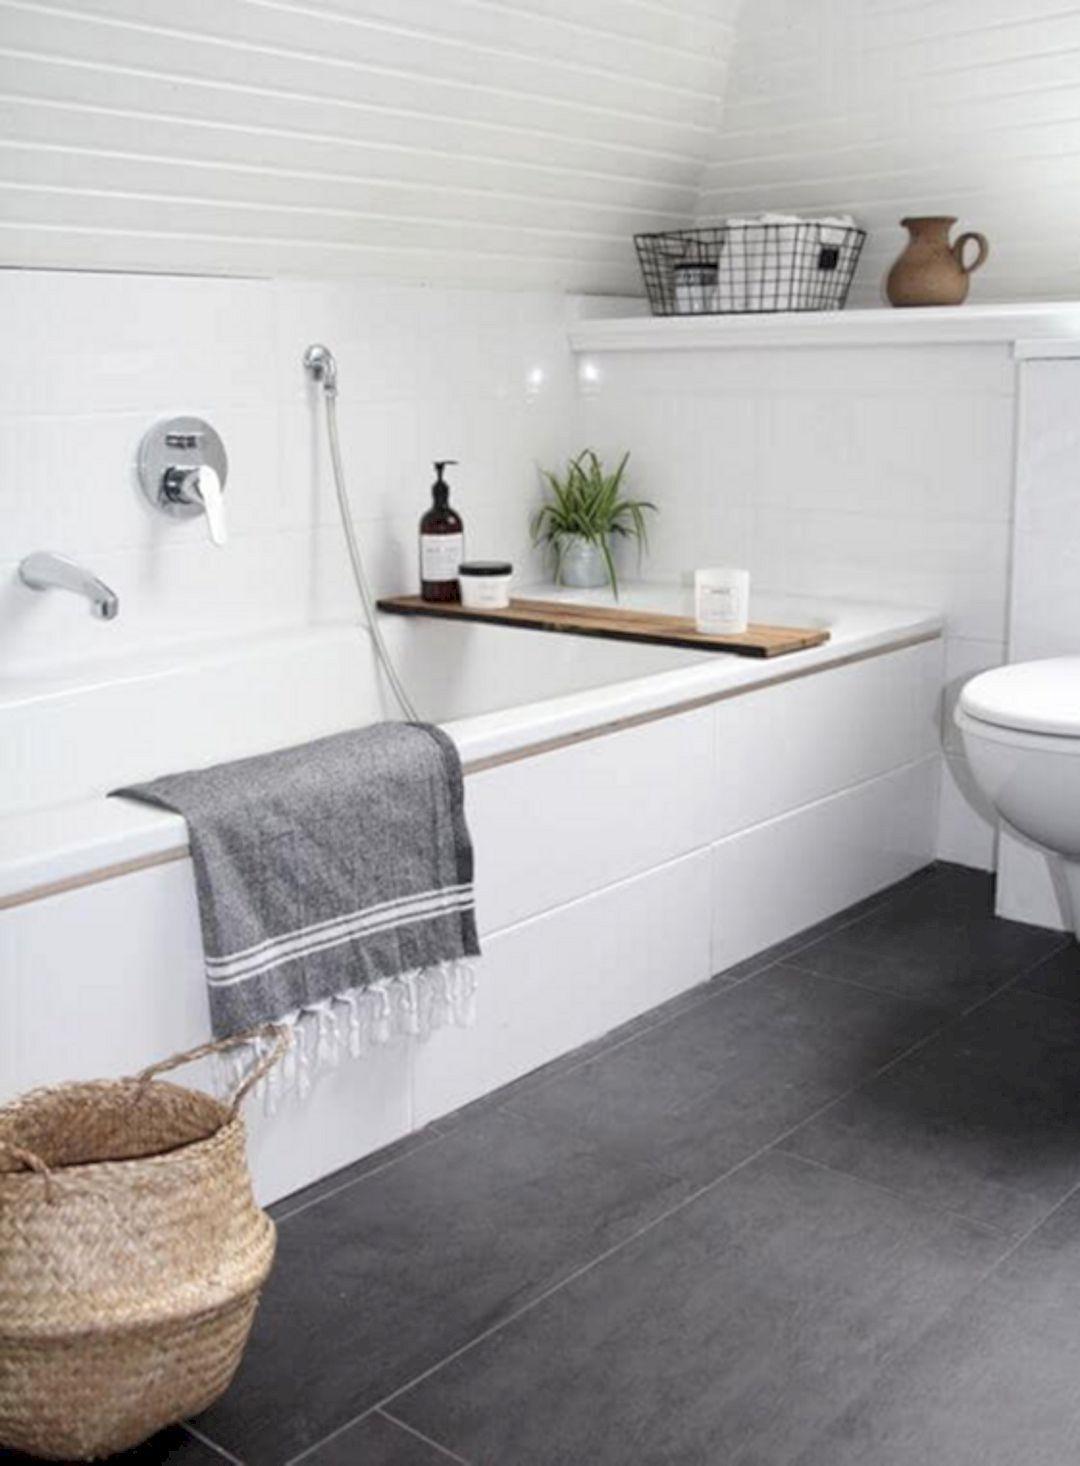 Stylish Modern Bathroom: 128 Best Designs Roundup | Interiors, Bath ...